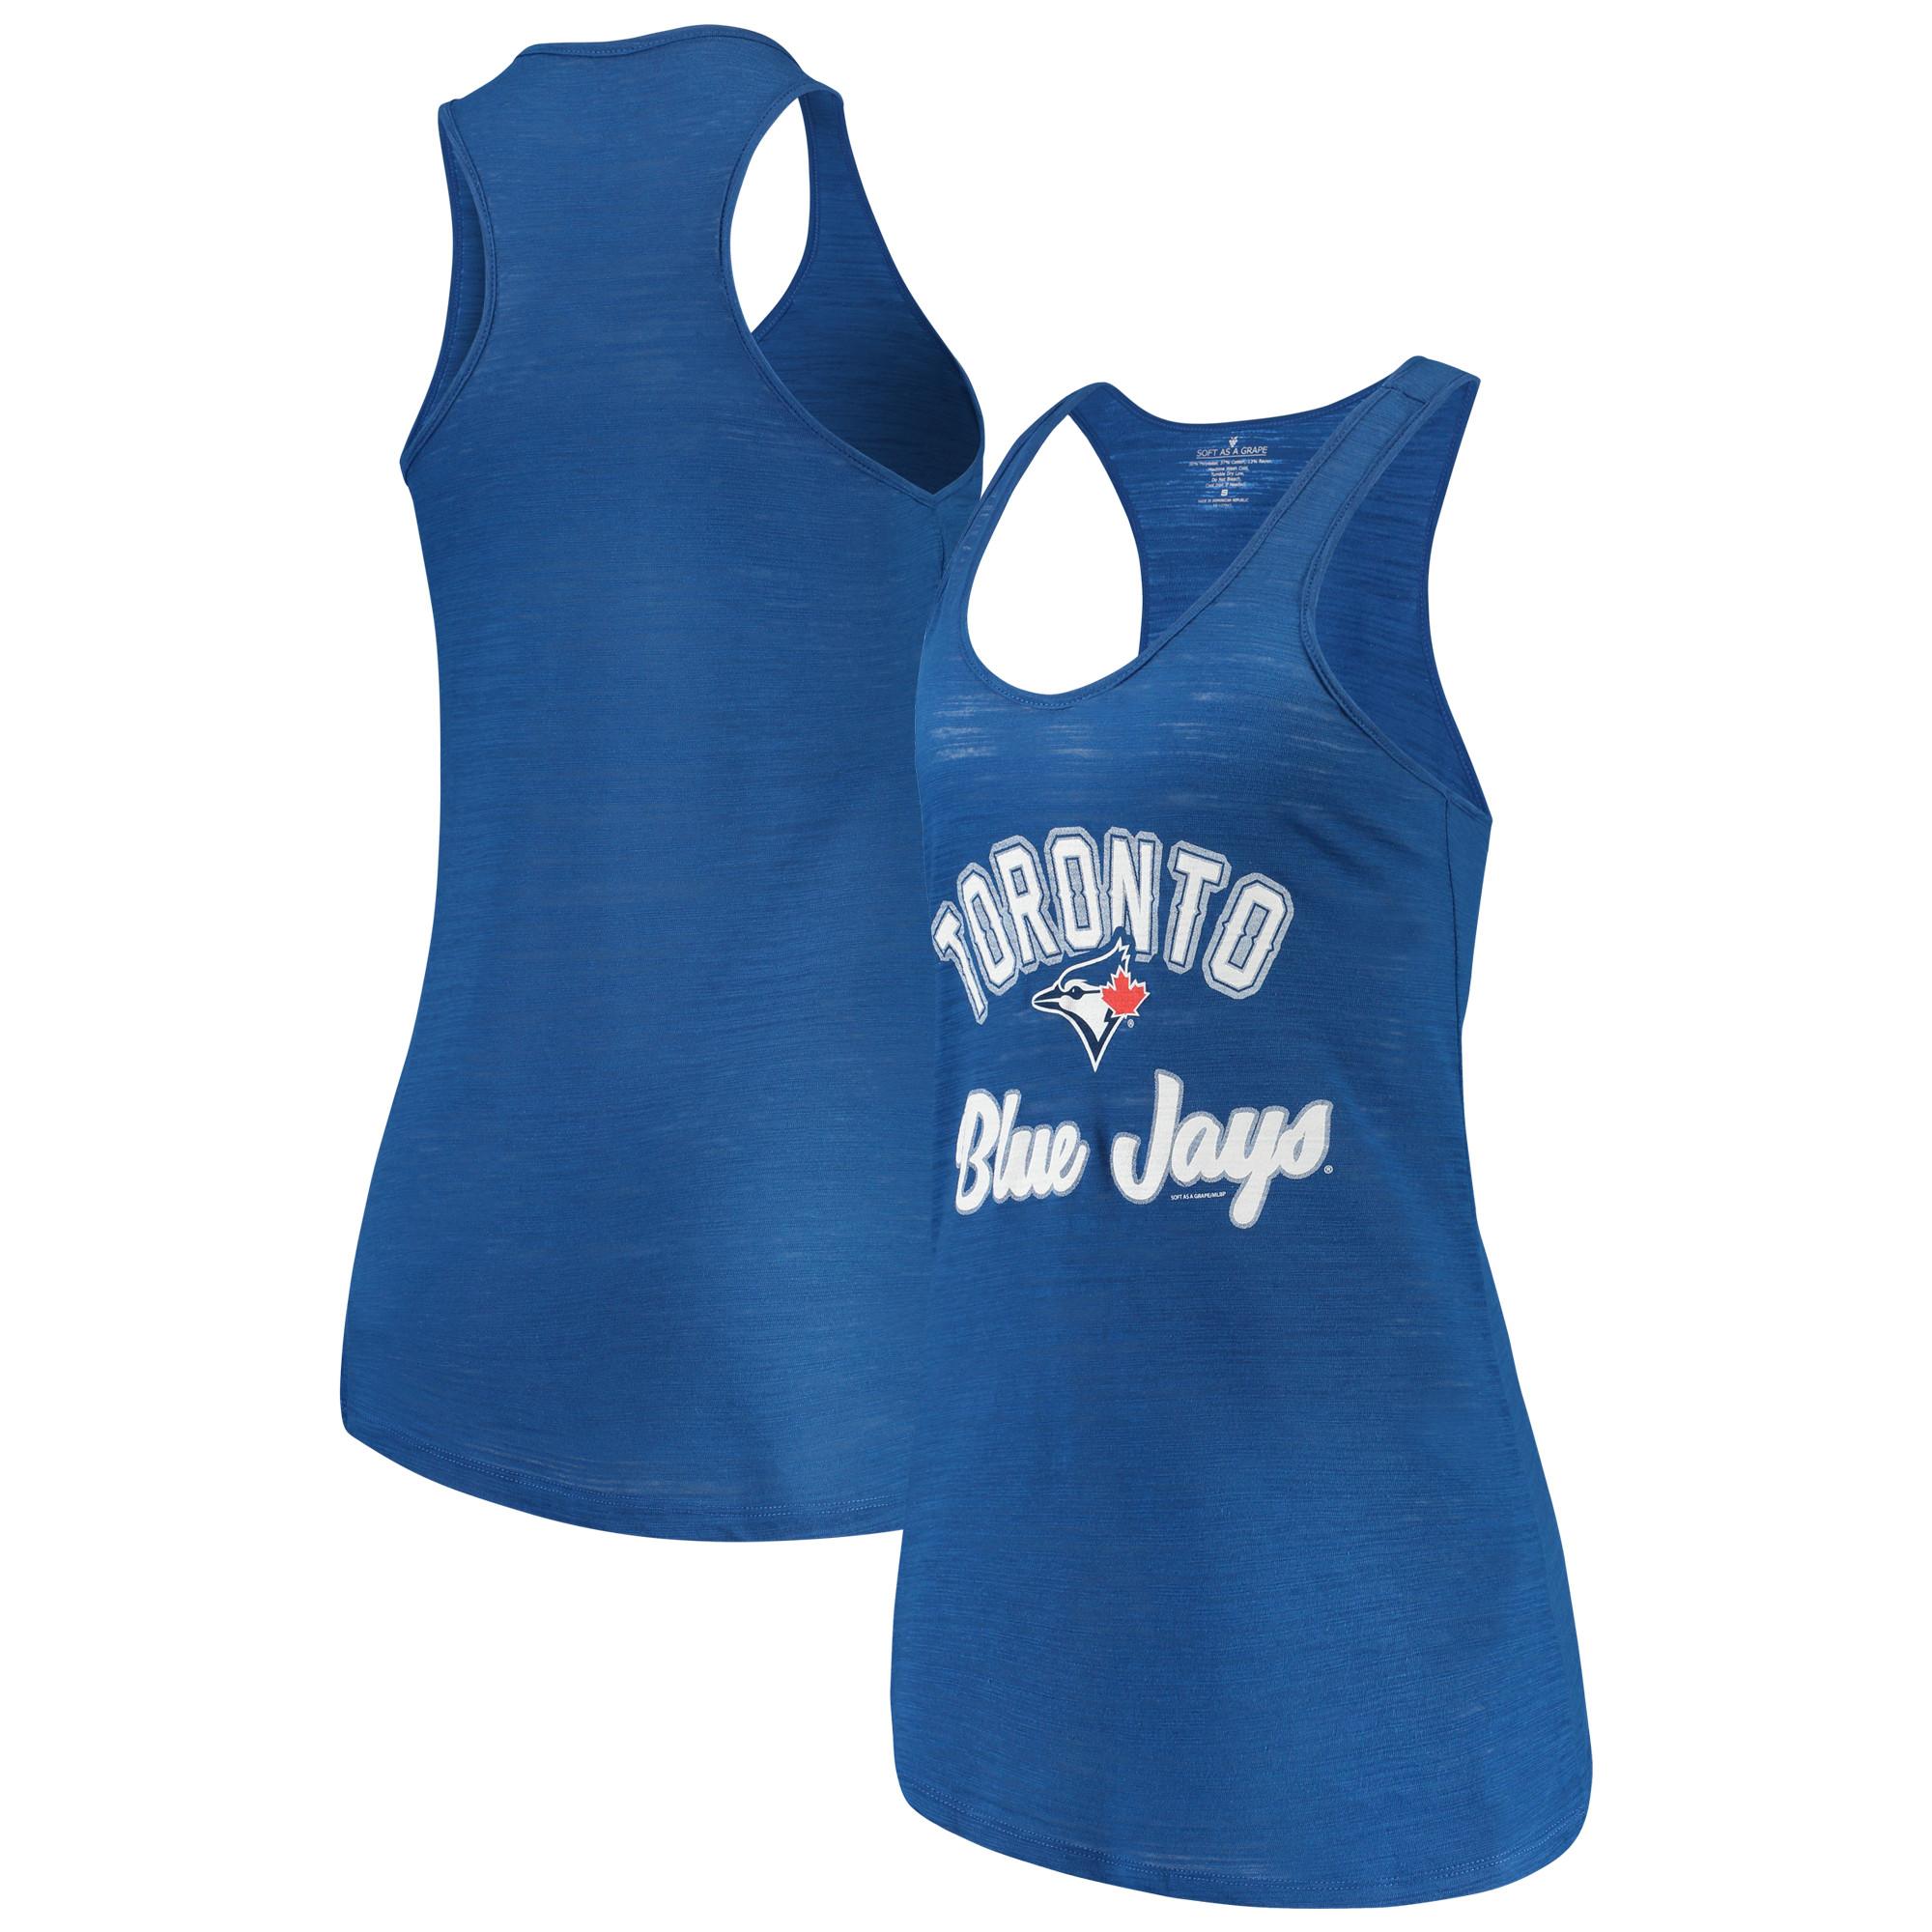 Toronto Blue Jays Soft as a Grape Women's Multicount Racerback Tank Top - Royal